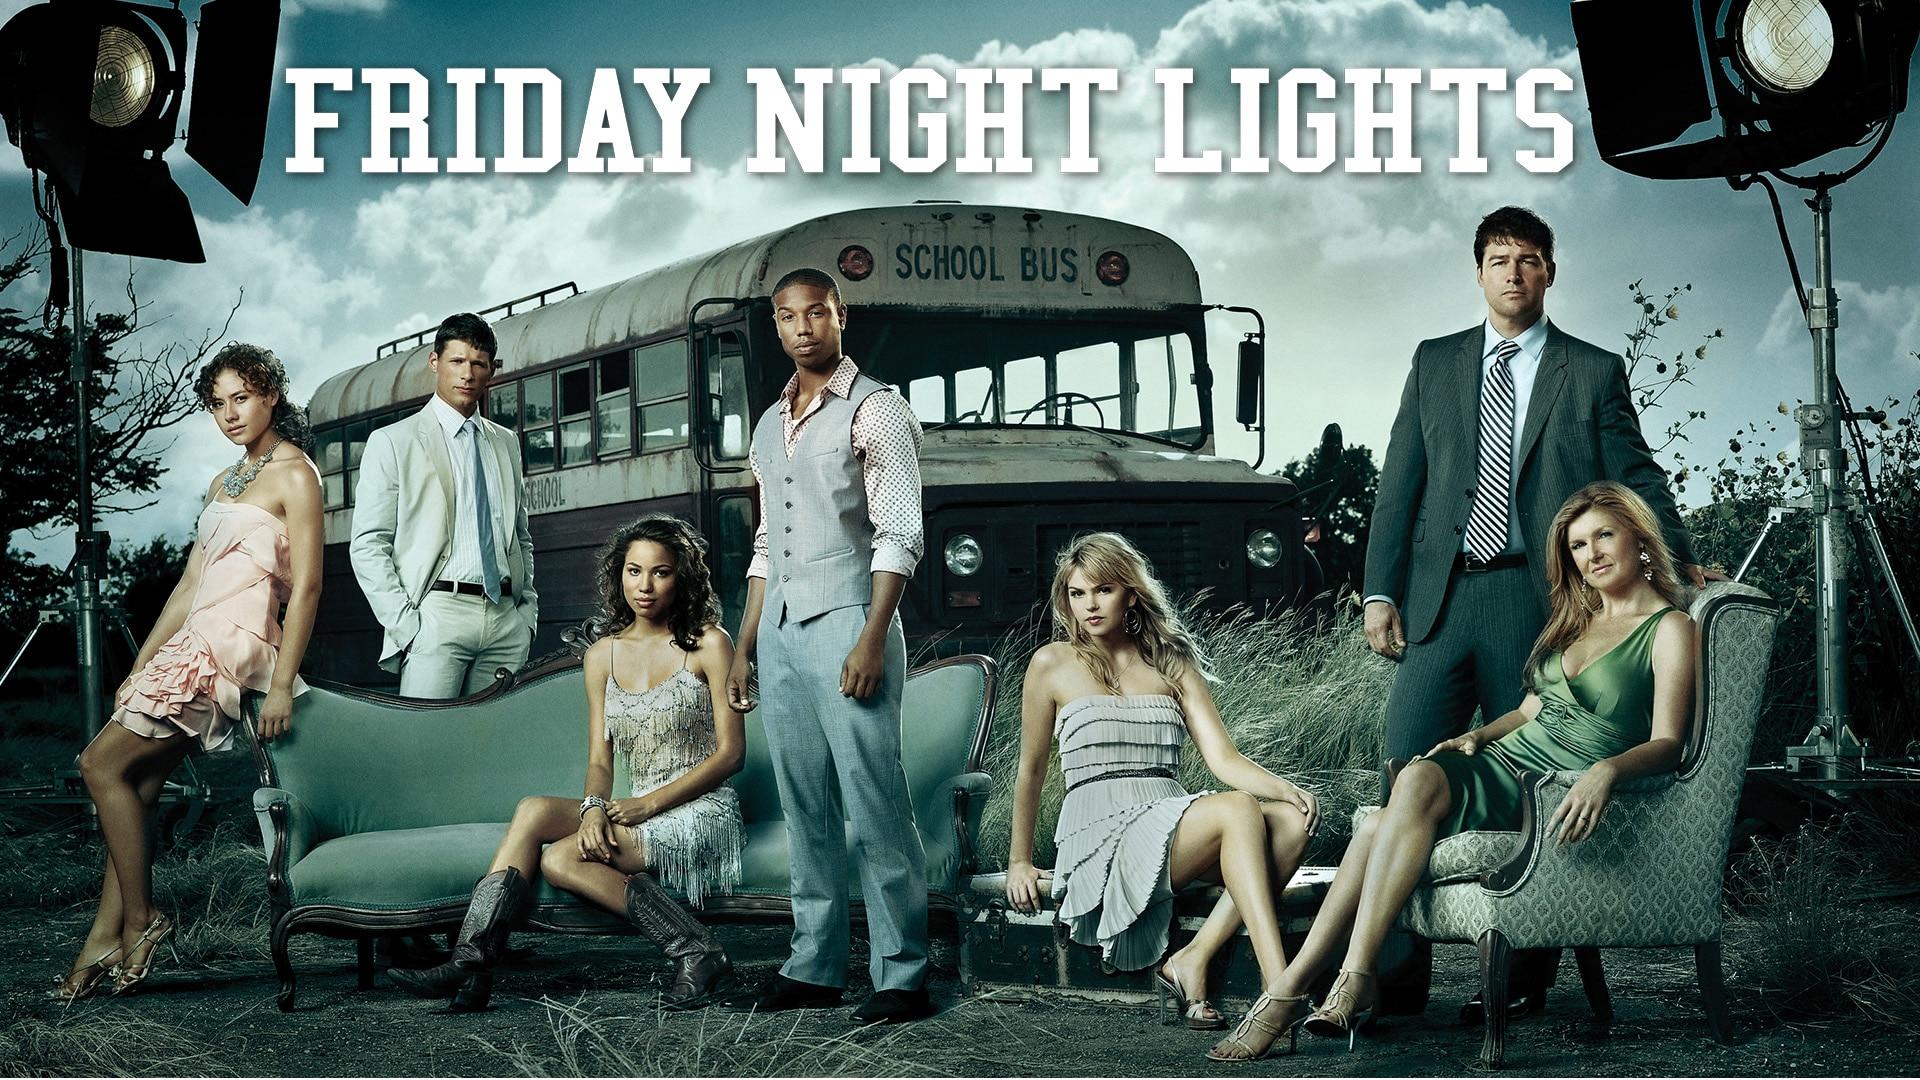 watch friday night lights tv show online free